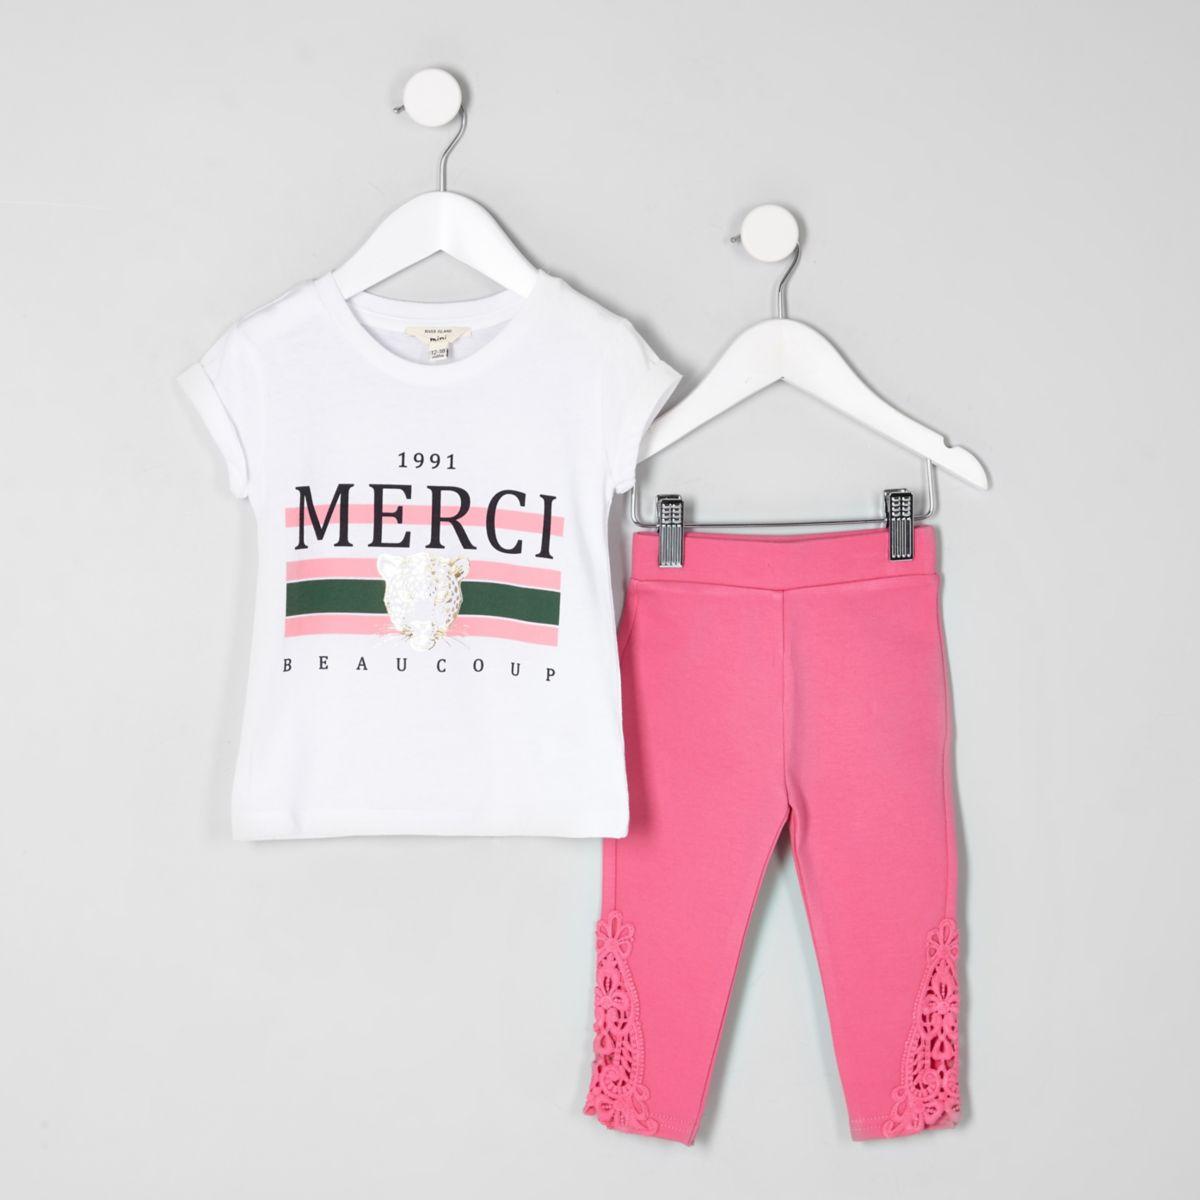 Mini girls white 'Merci' T-shirt outfit